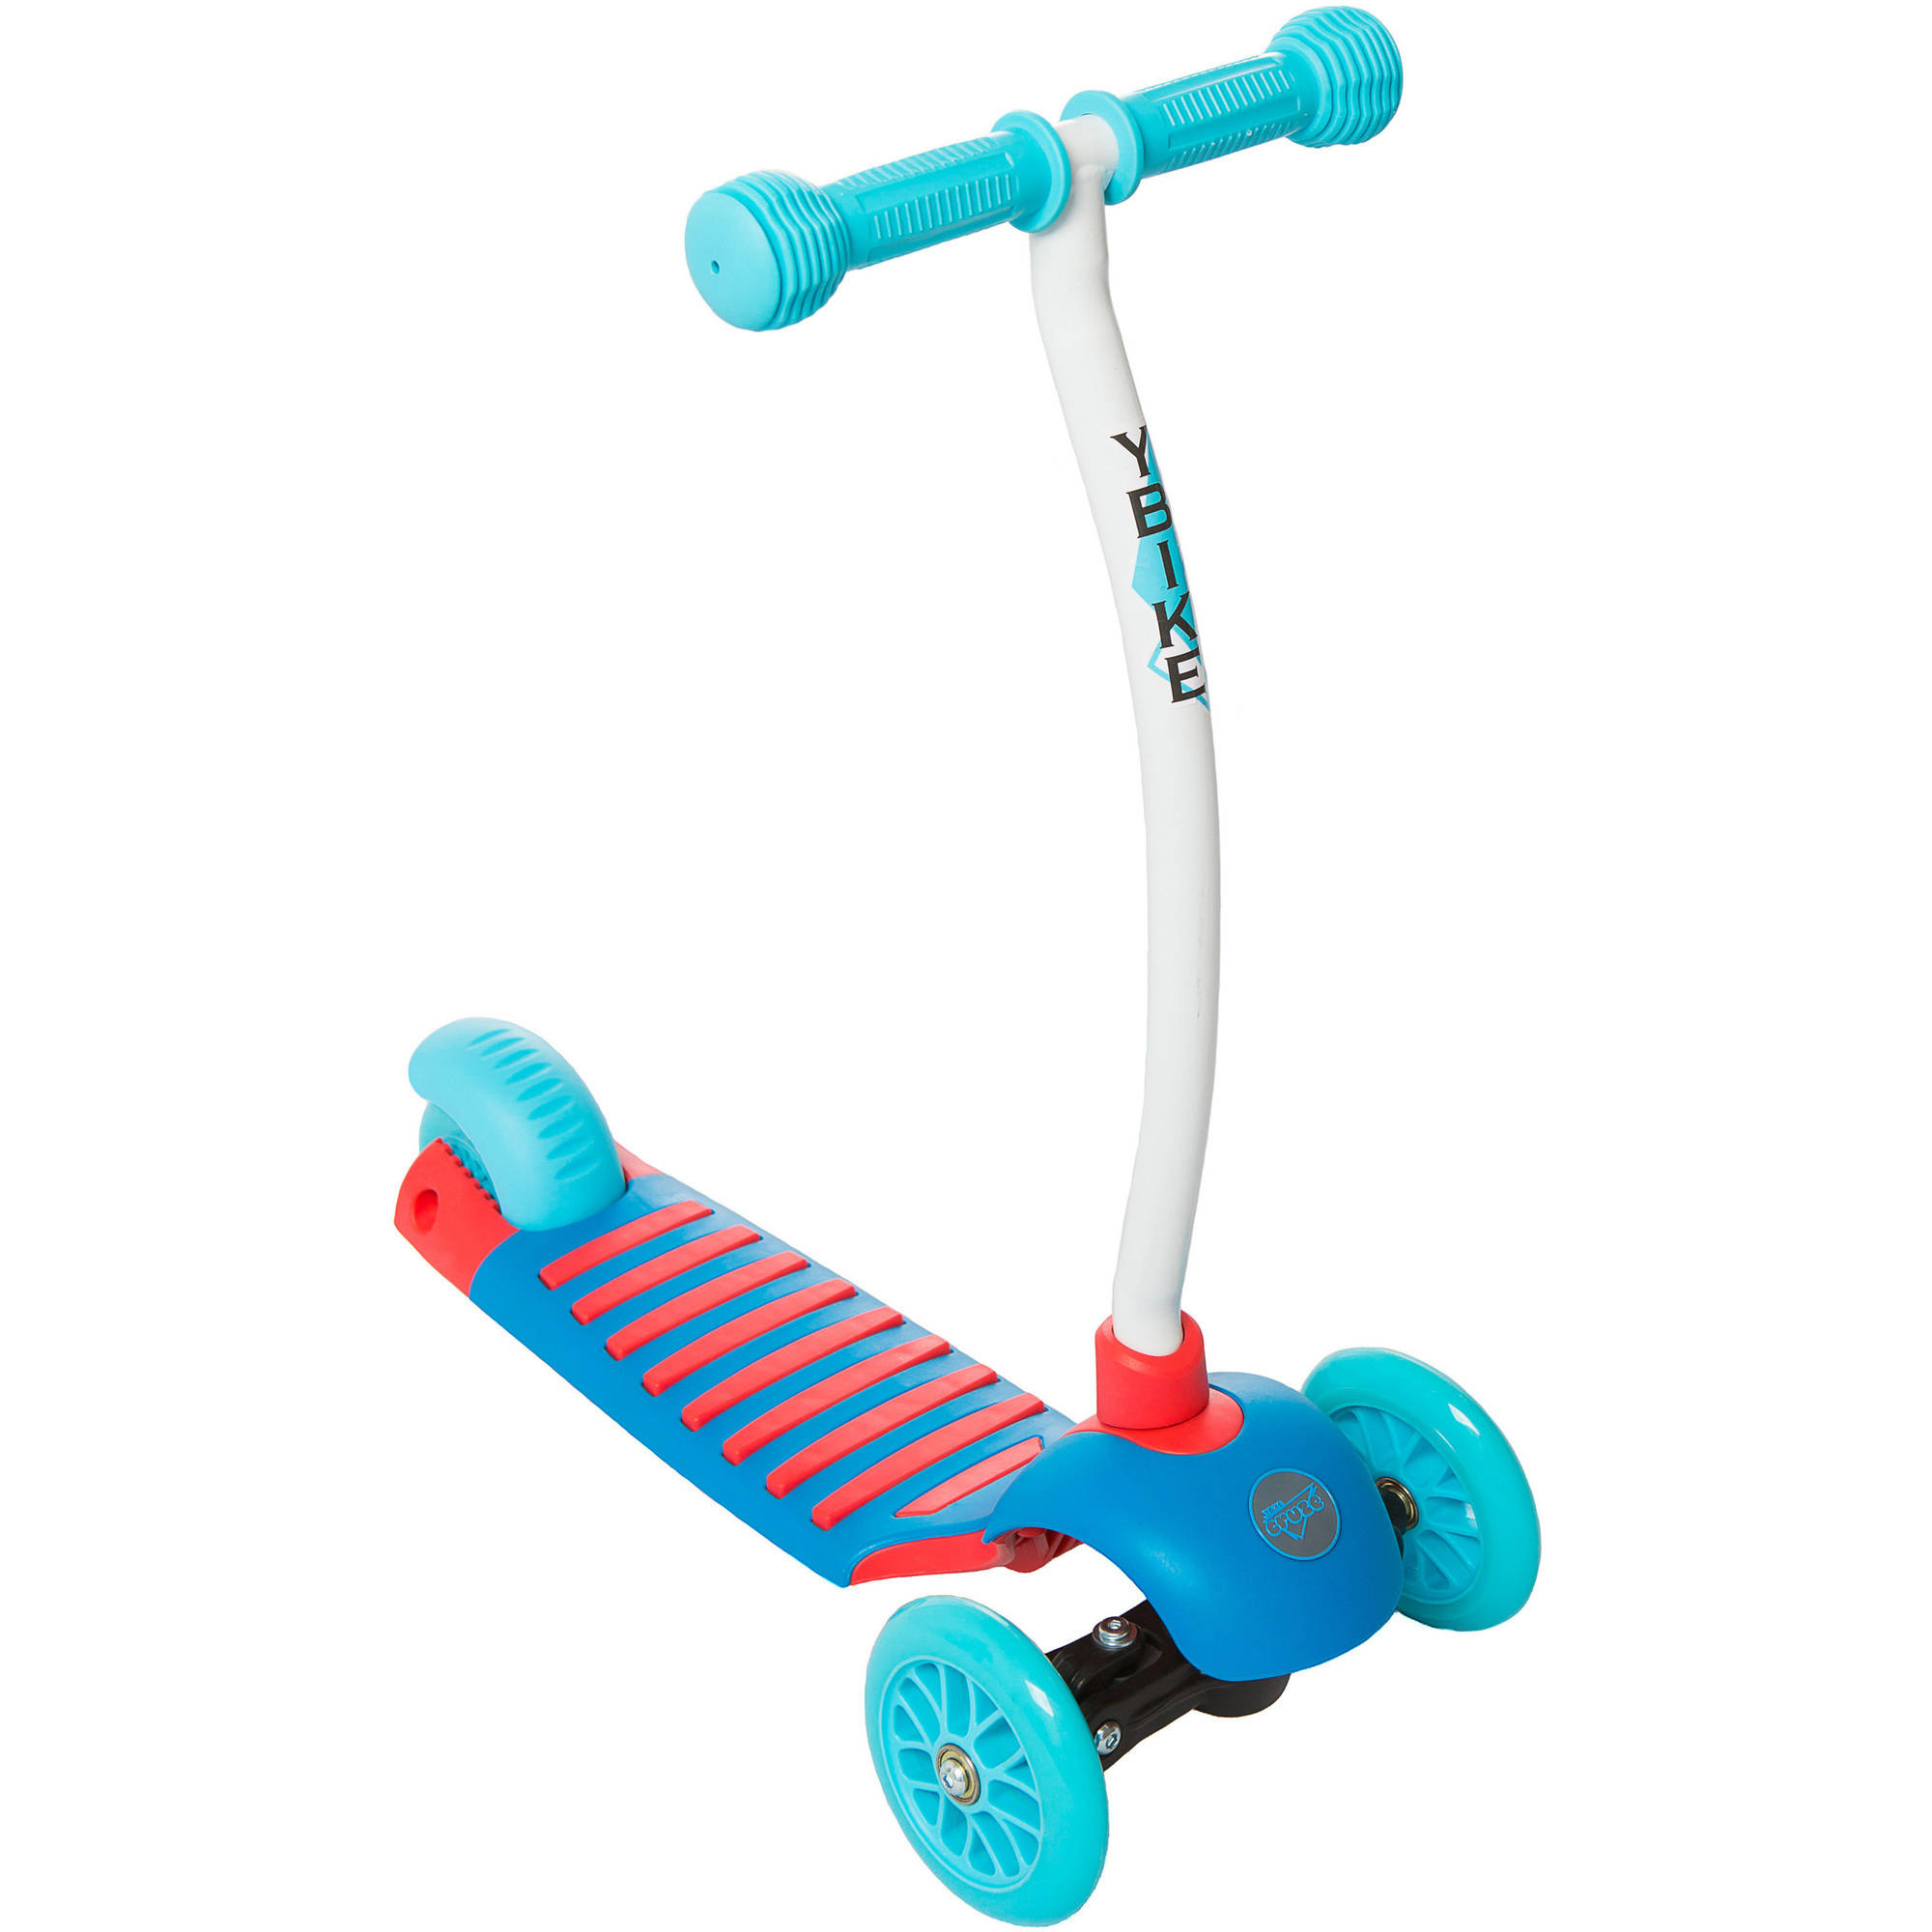 YBike GLX Cruze 3-Wheel Scooter by National Sporting Goods